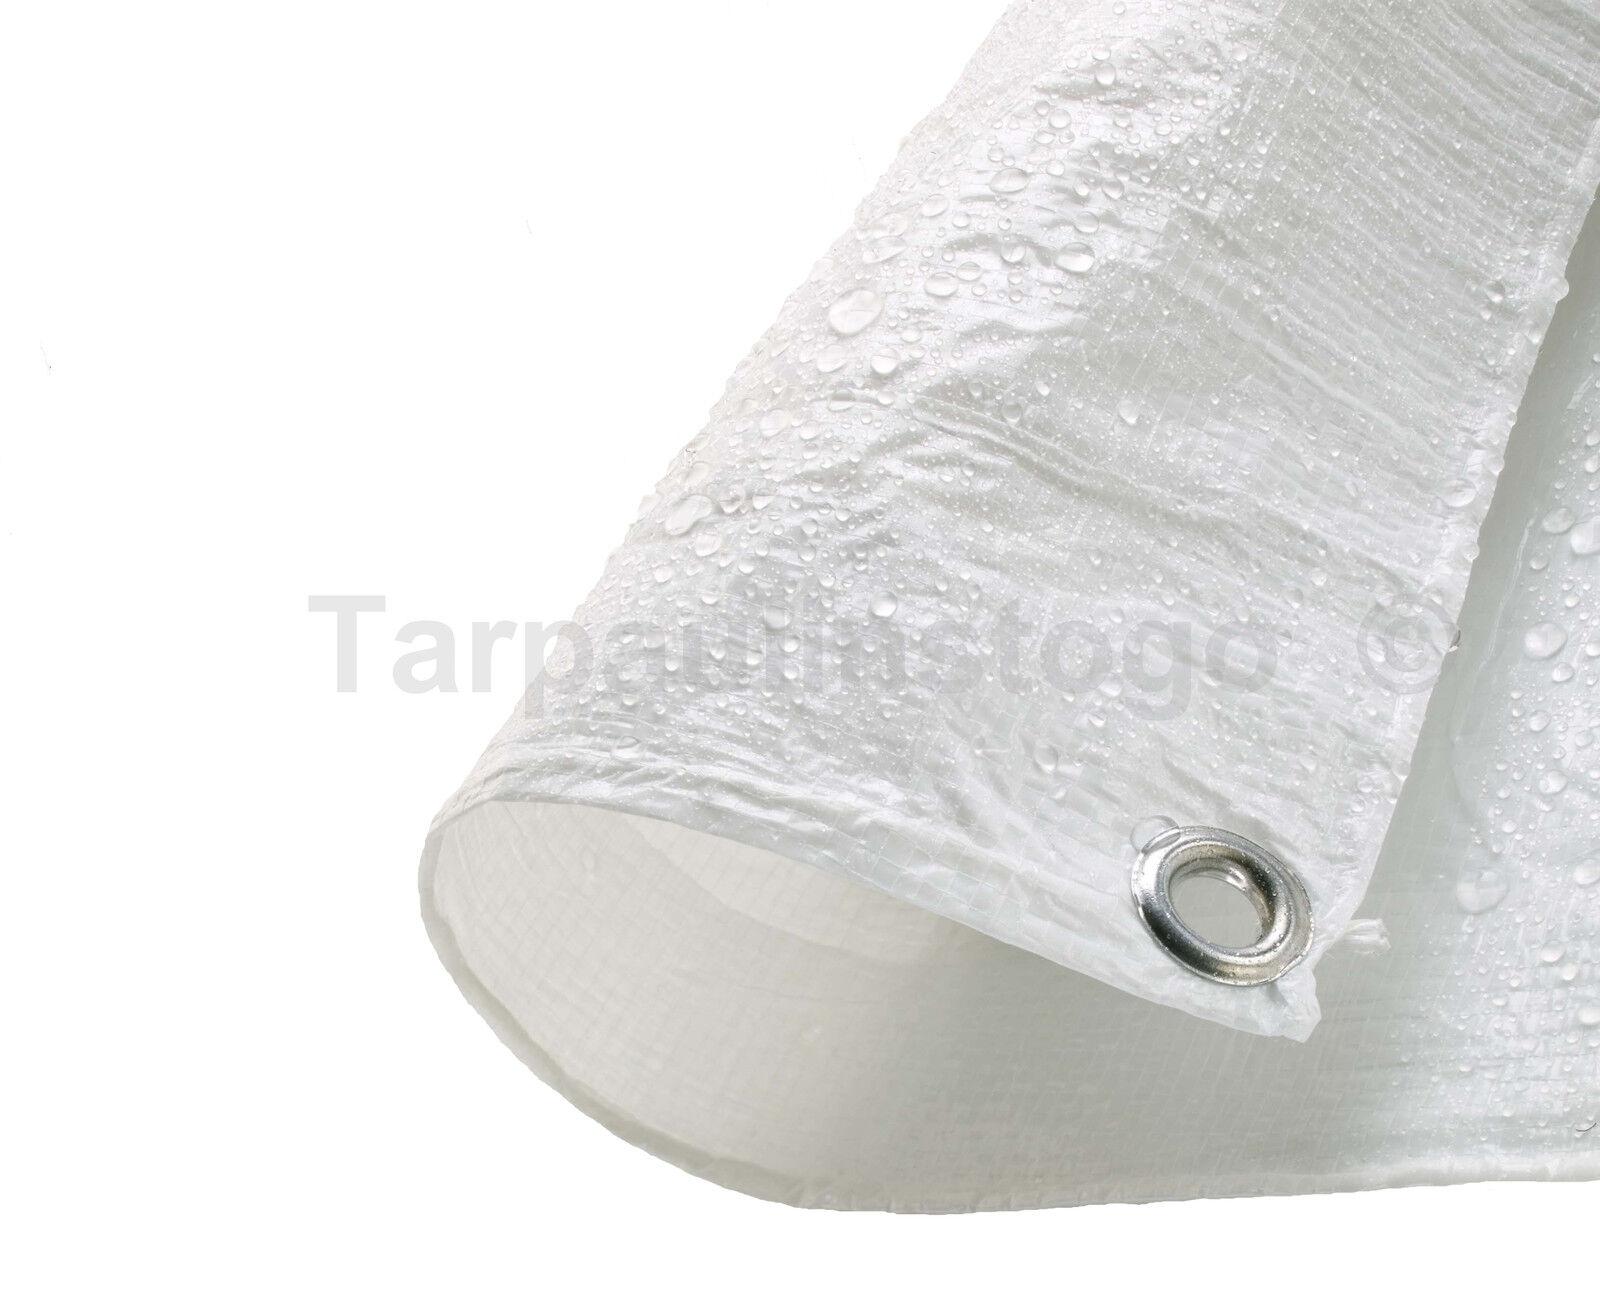 Waterproof Tarpaulin Ground Sheet Lightweight Camping Cover Tarp with Eyelets - 6